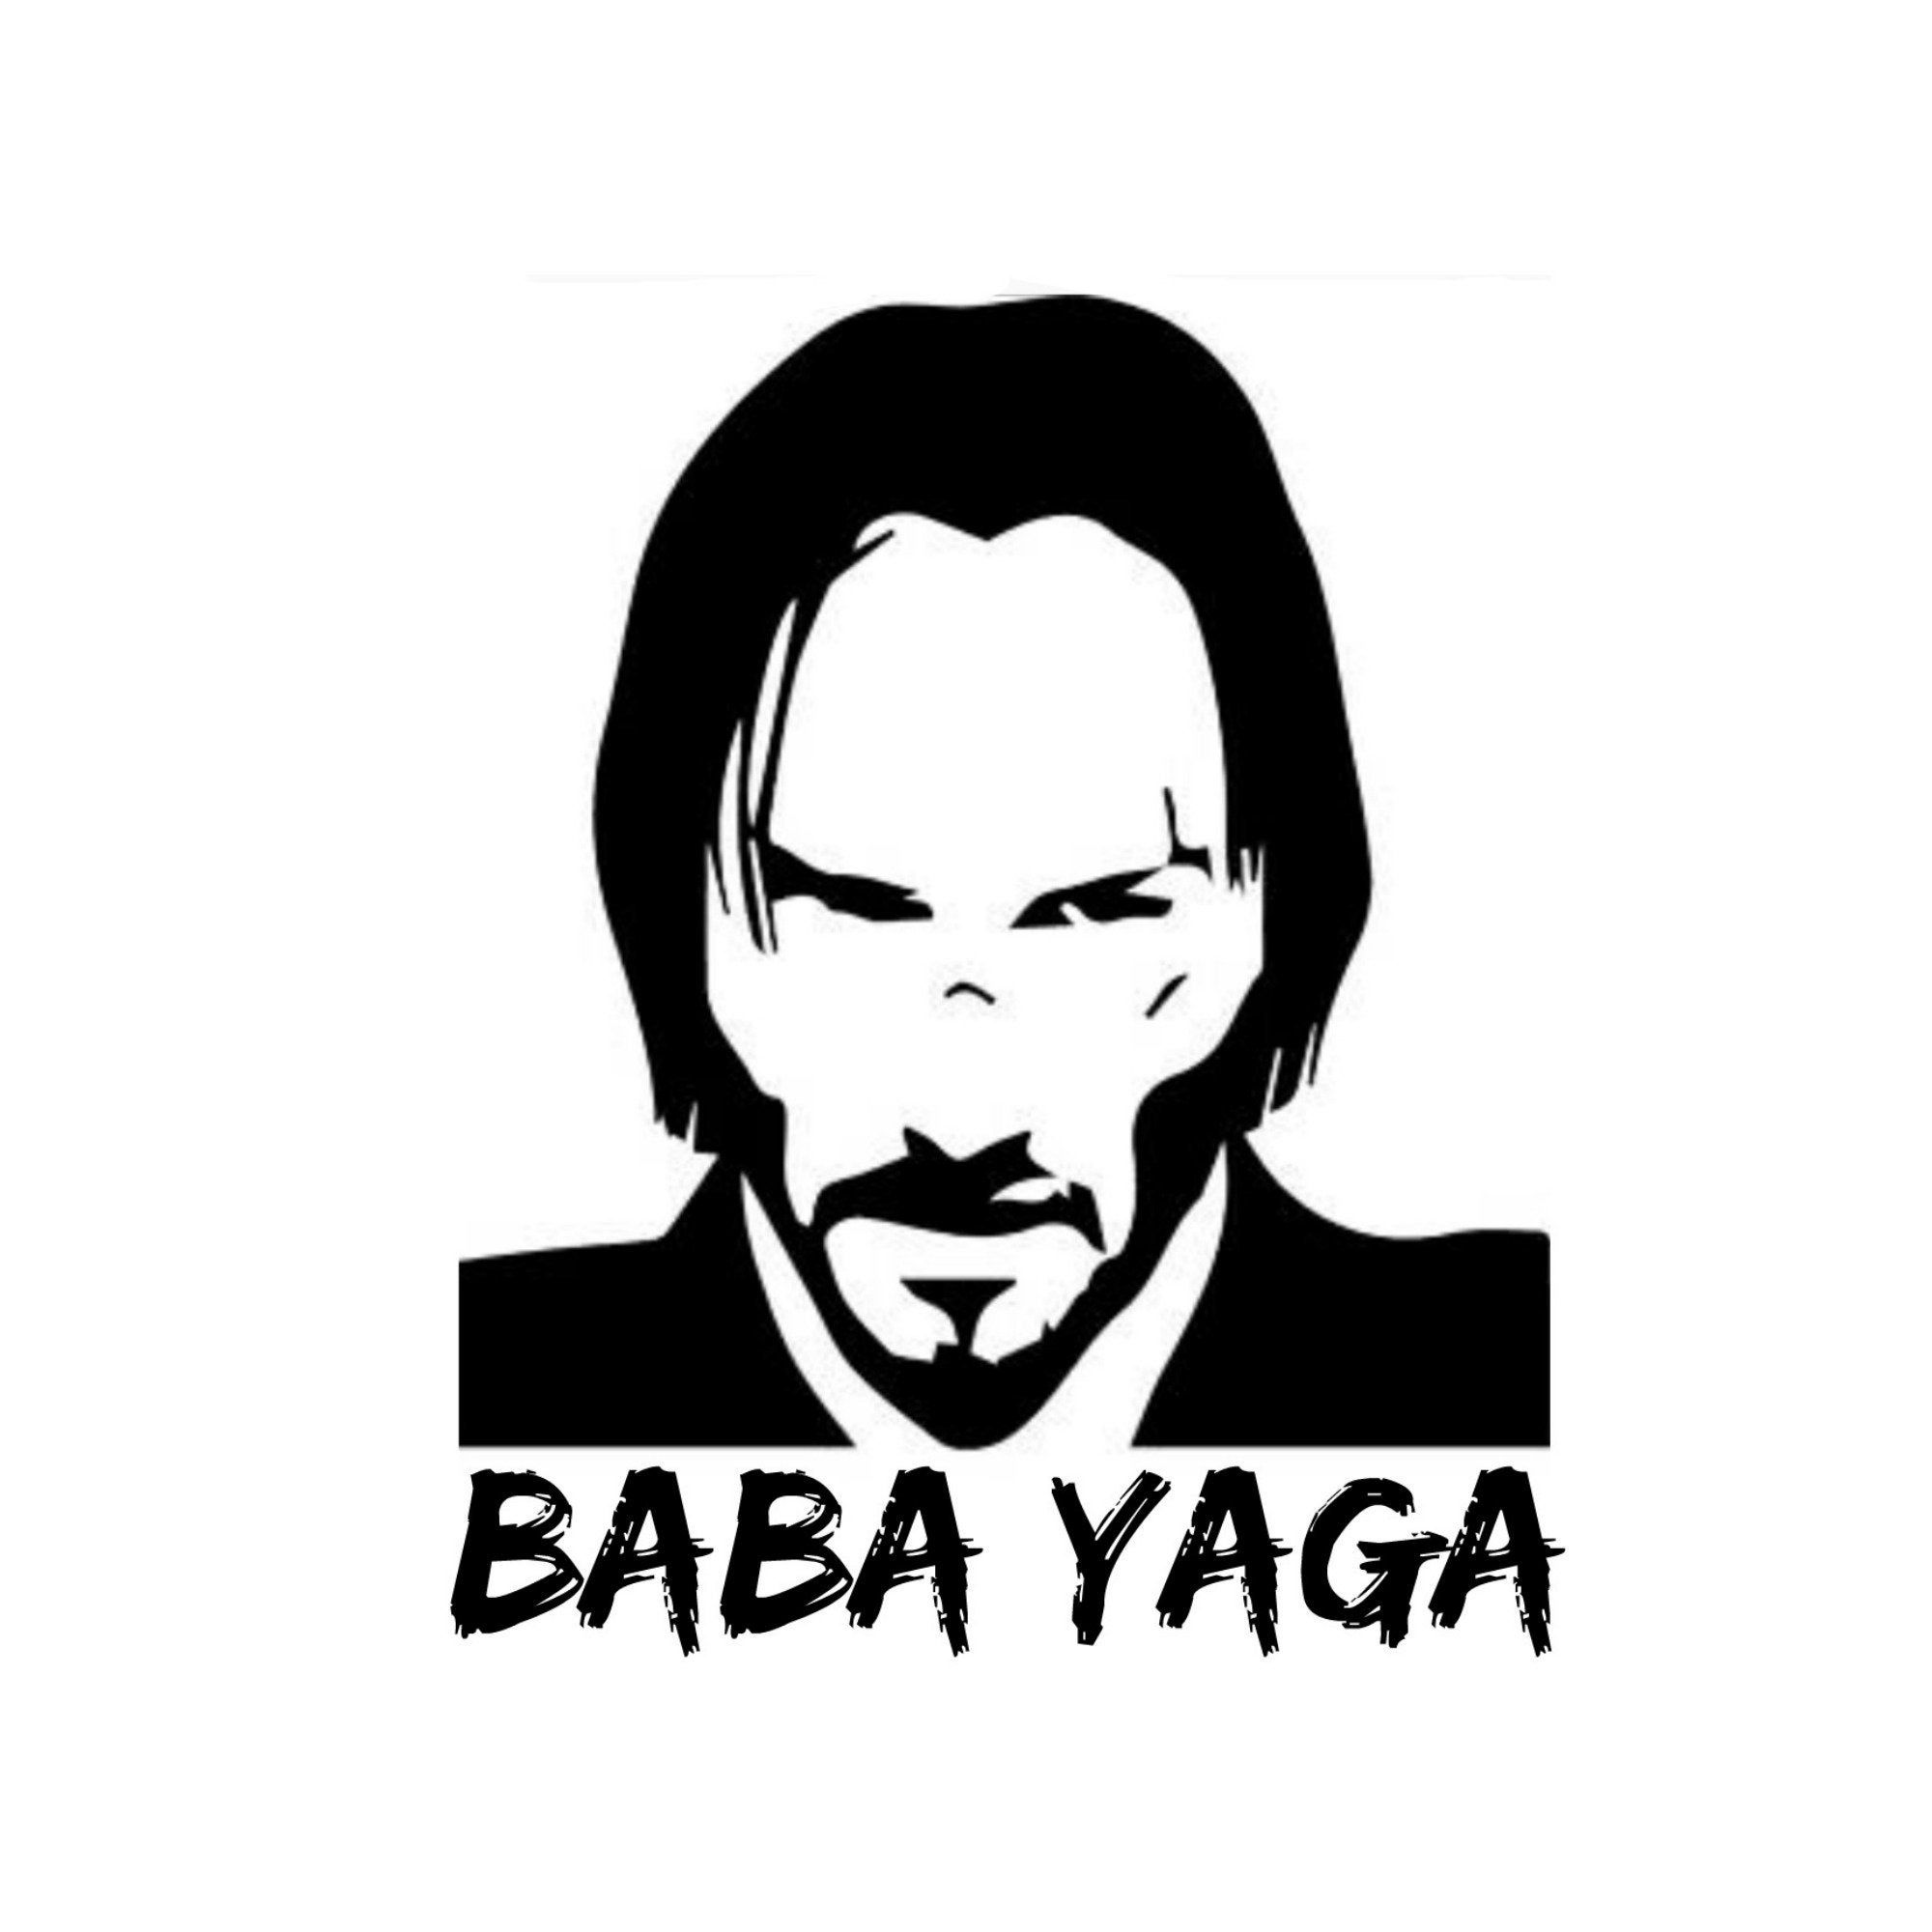 John Wick Baba Yaga Vinyl Decal Yeti Cups Laptops Cars John Wick Tattoo Funny Cartoon Faces Film Posters Minimalist